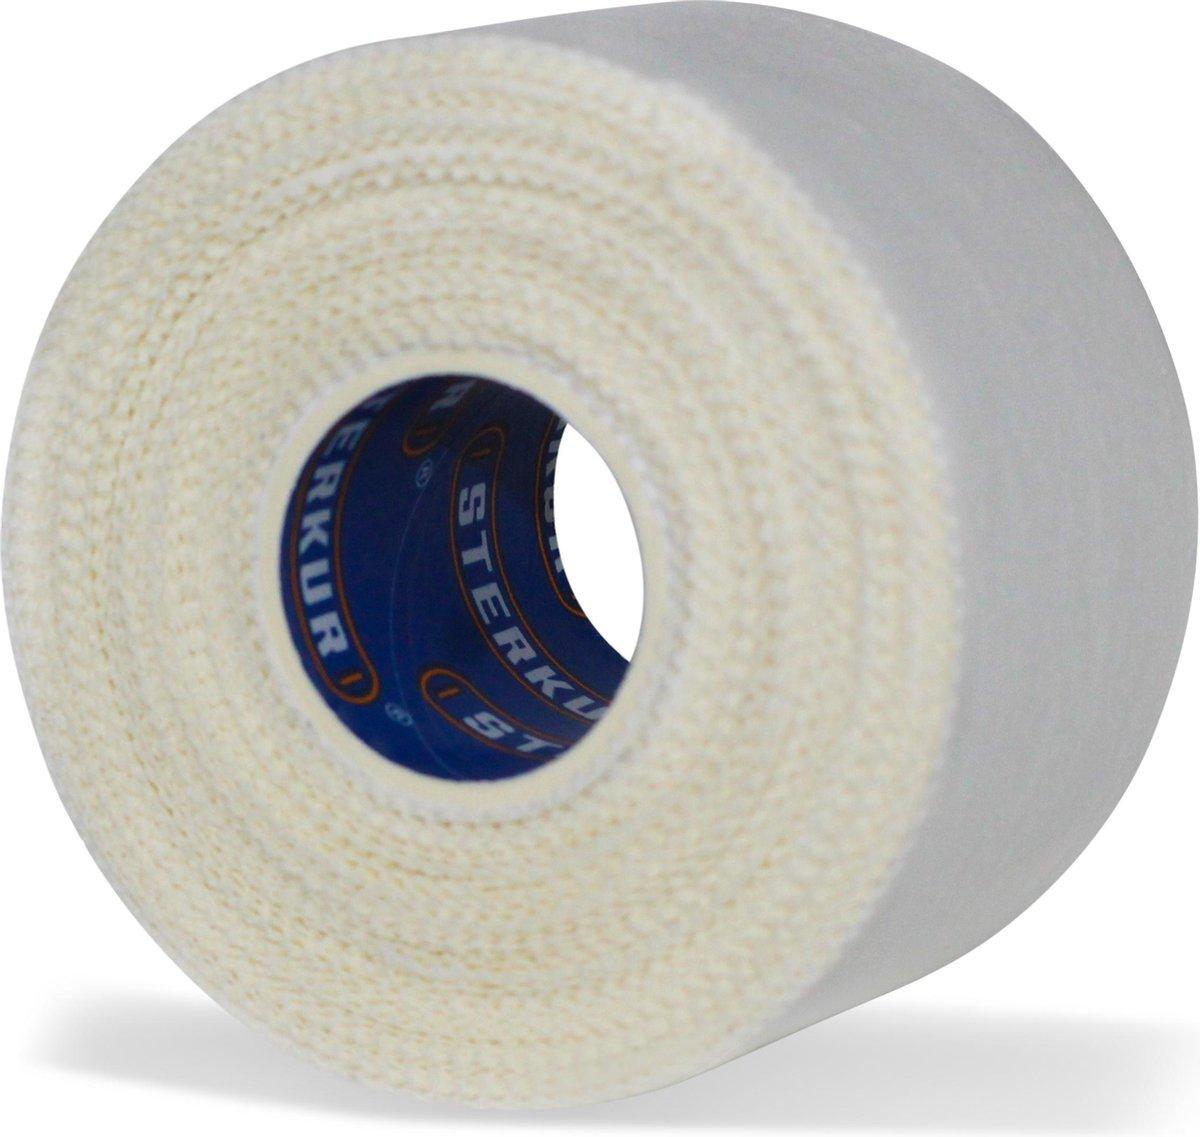 Sterkur  Sporttape Classic 3.8cm * 10m - Geschikt voor enkels en handen - Blessure tape - Witte spor